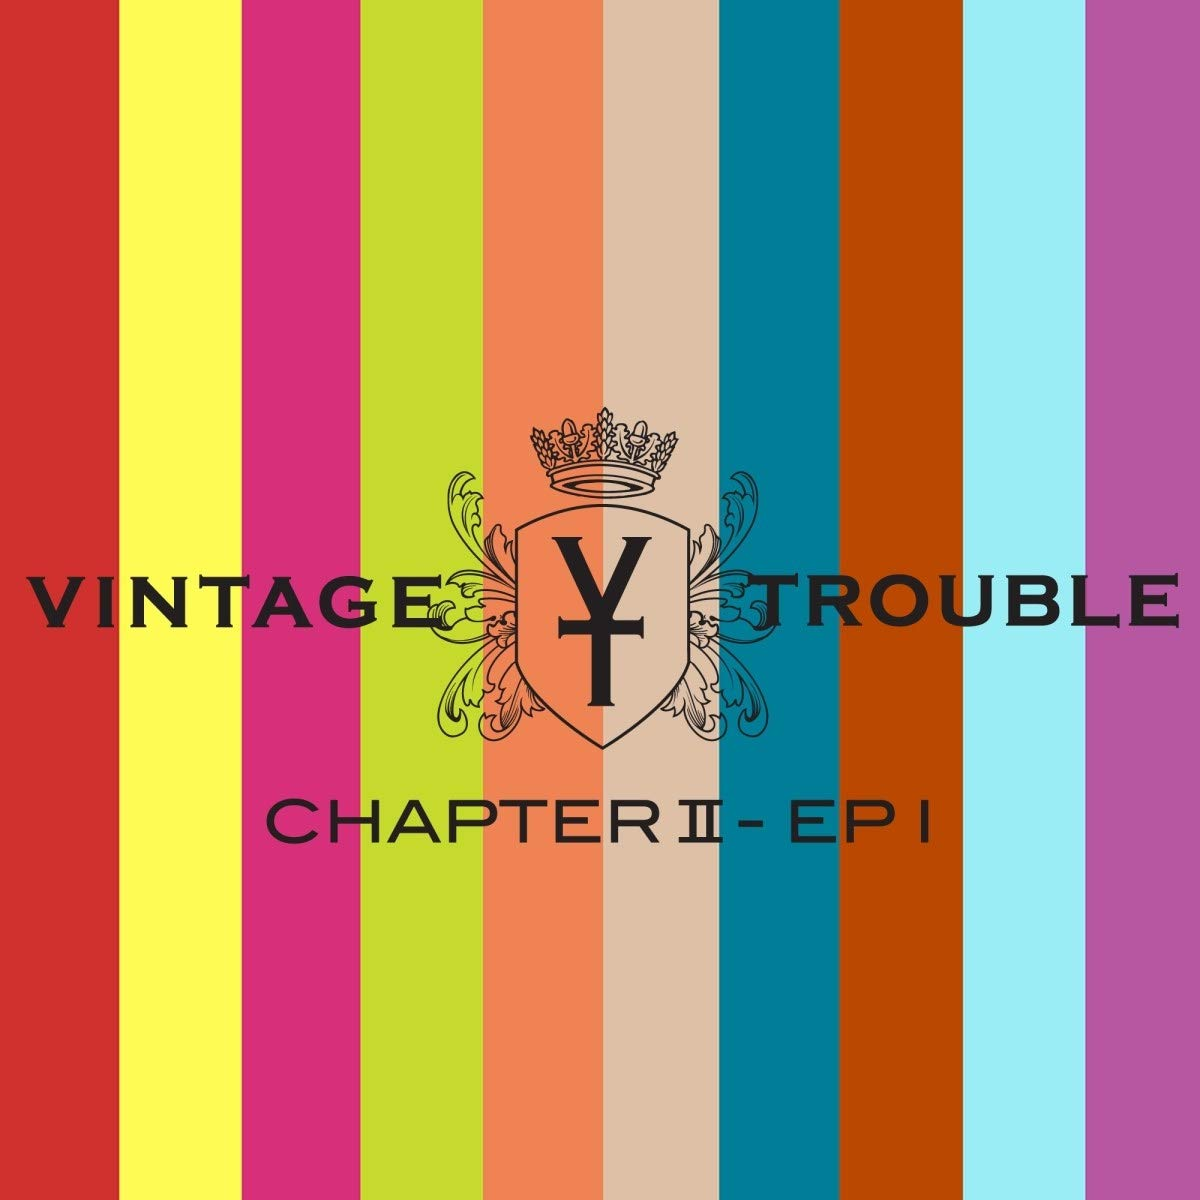 Vintage Trouble - Chapter Ii